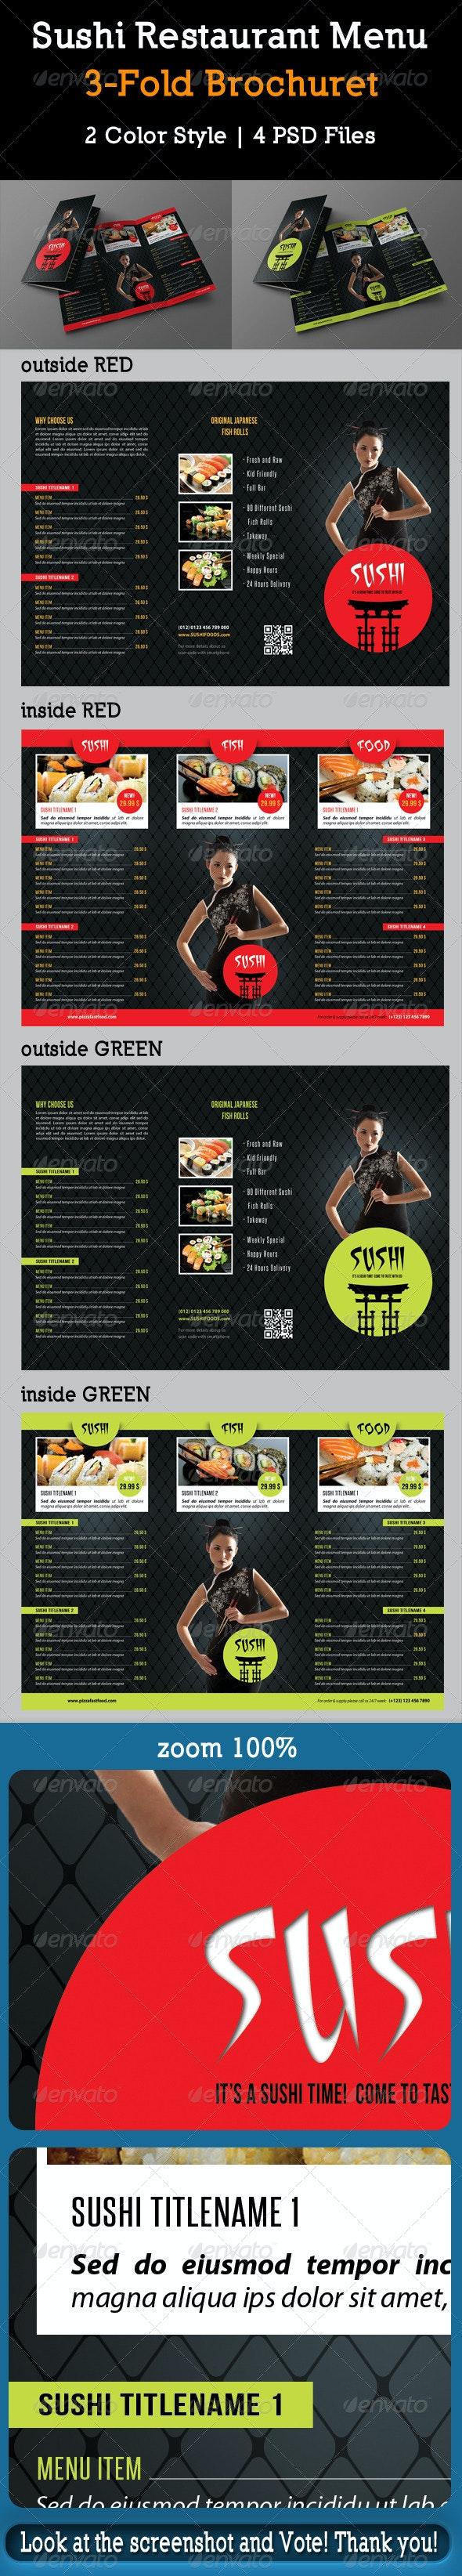 Sushi Restaurant Menu 3-Fold Brochure 03 - Food Menus Print Templates